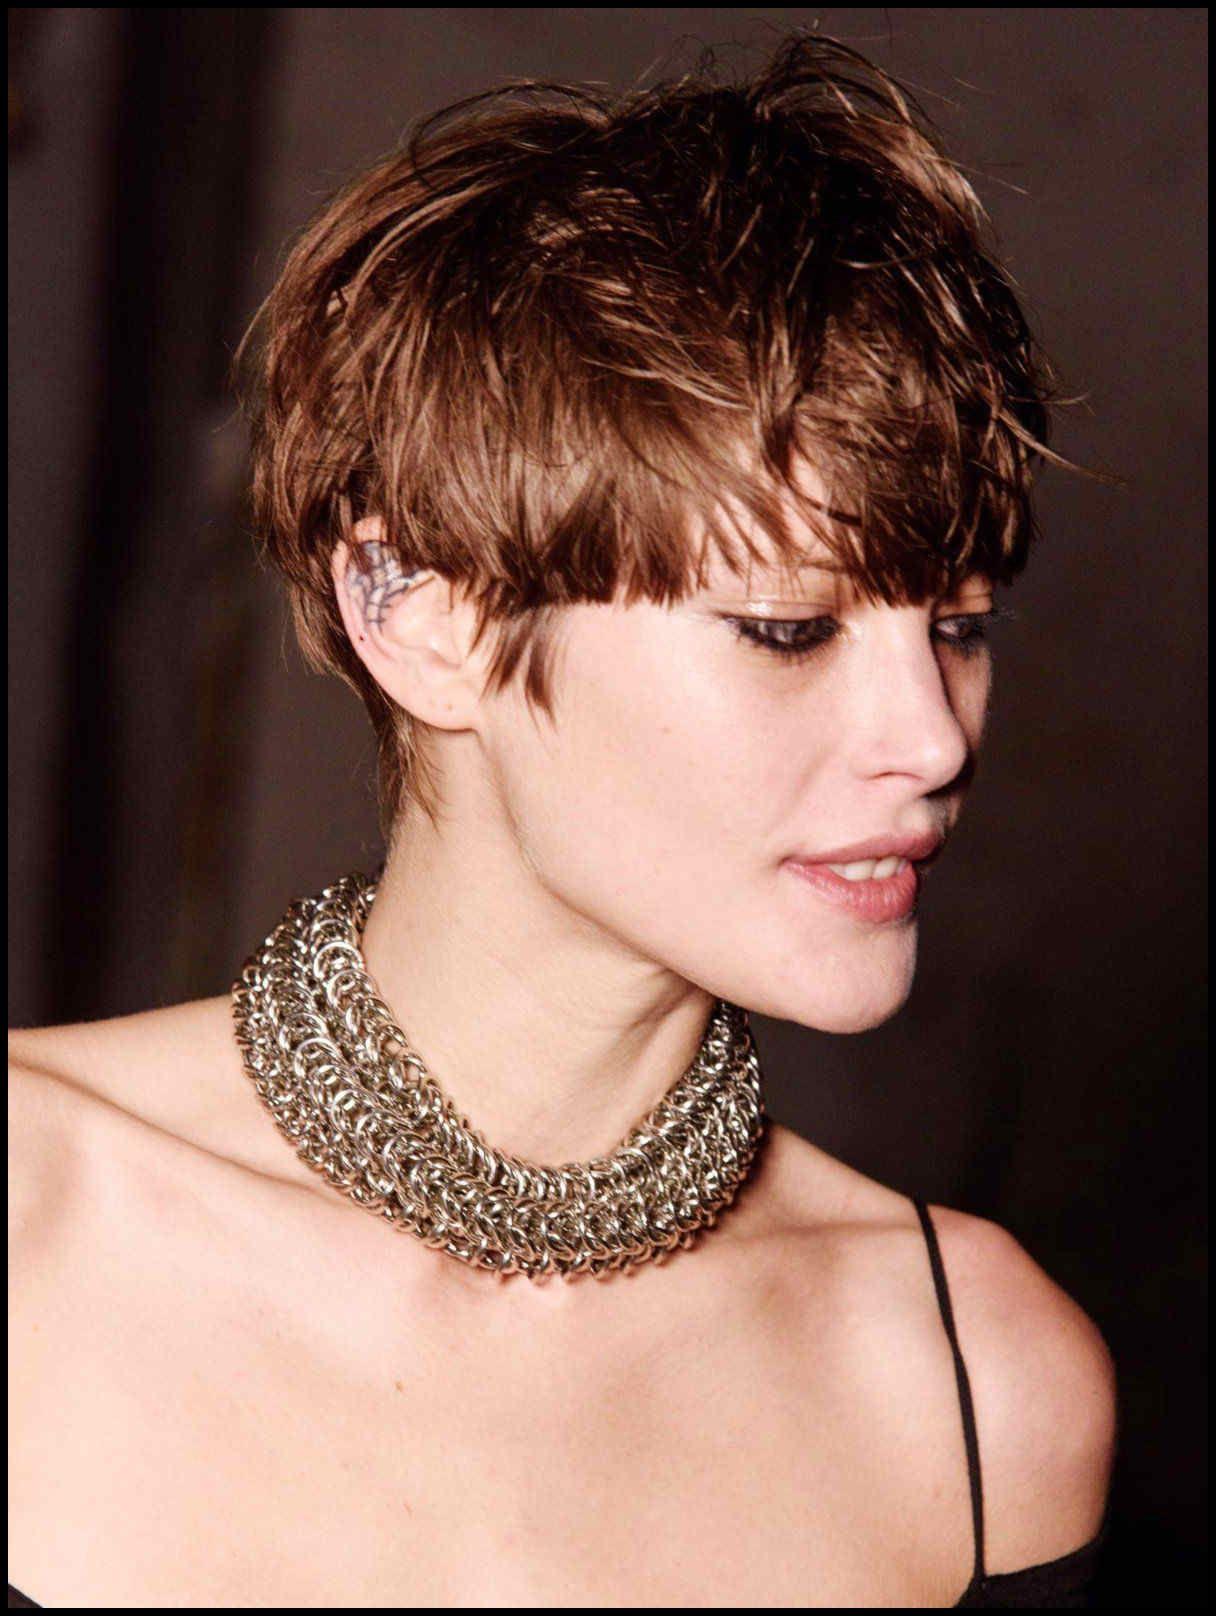 Pilzkopf Frisur Damen Inspirational 28 Neu Kurzhaarfrisuren Damen